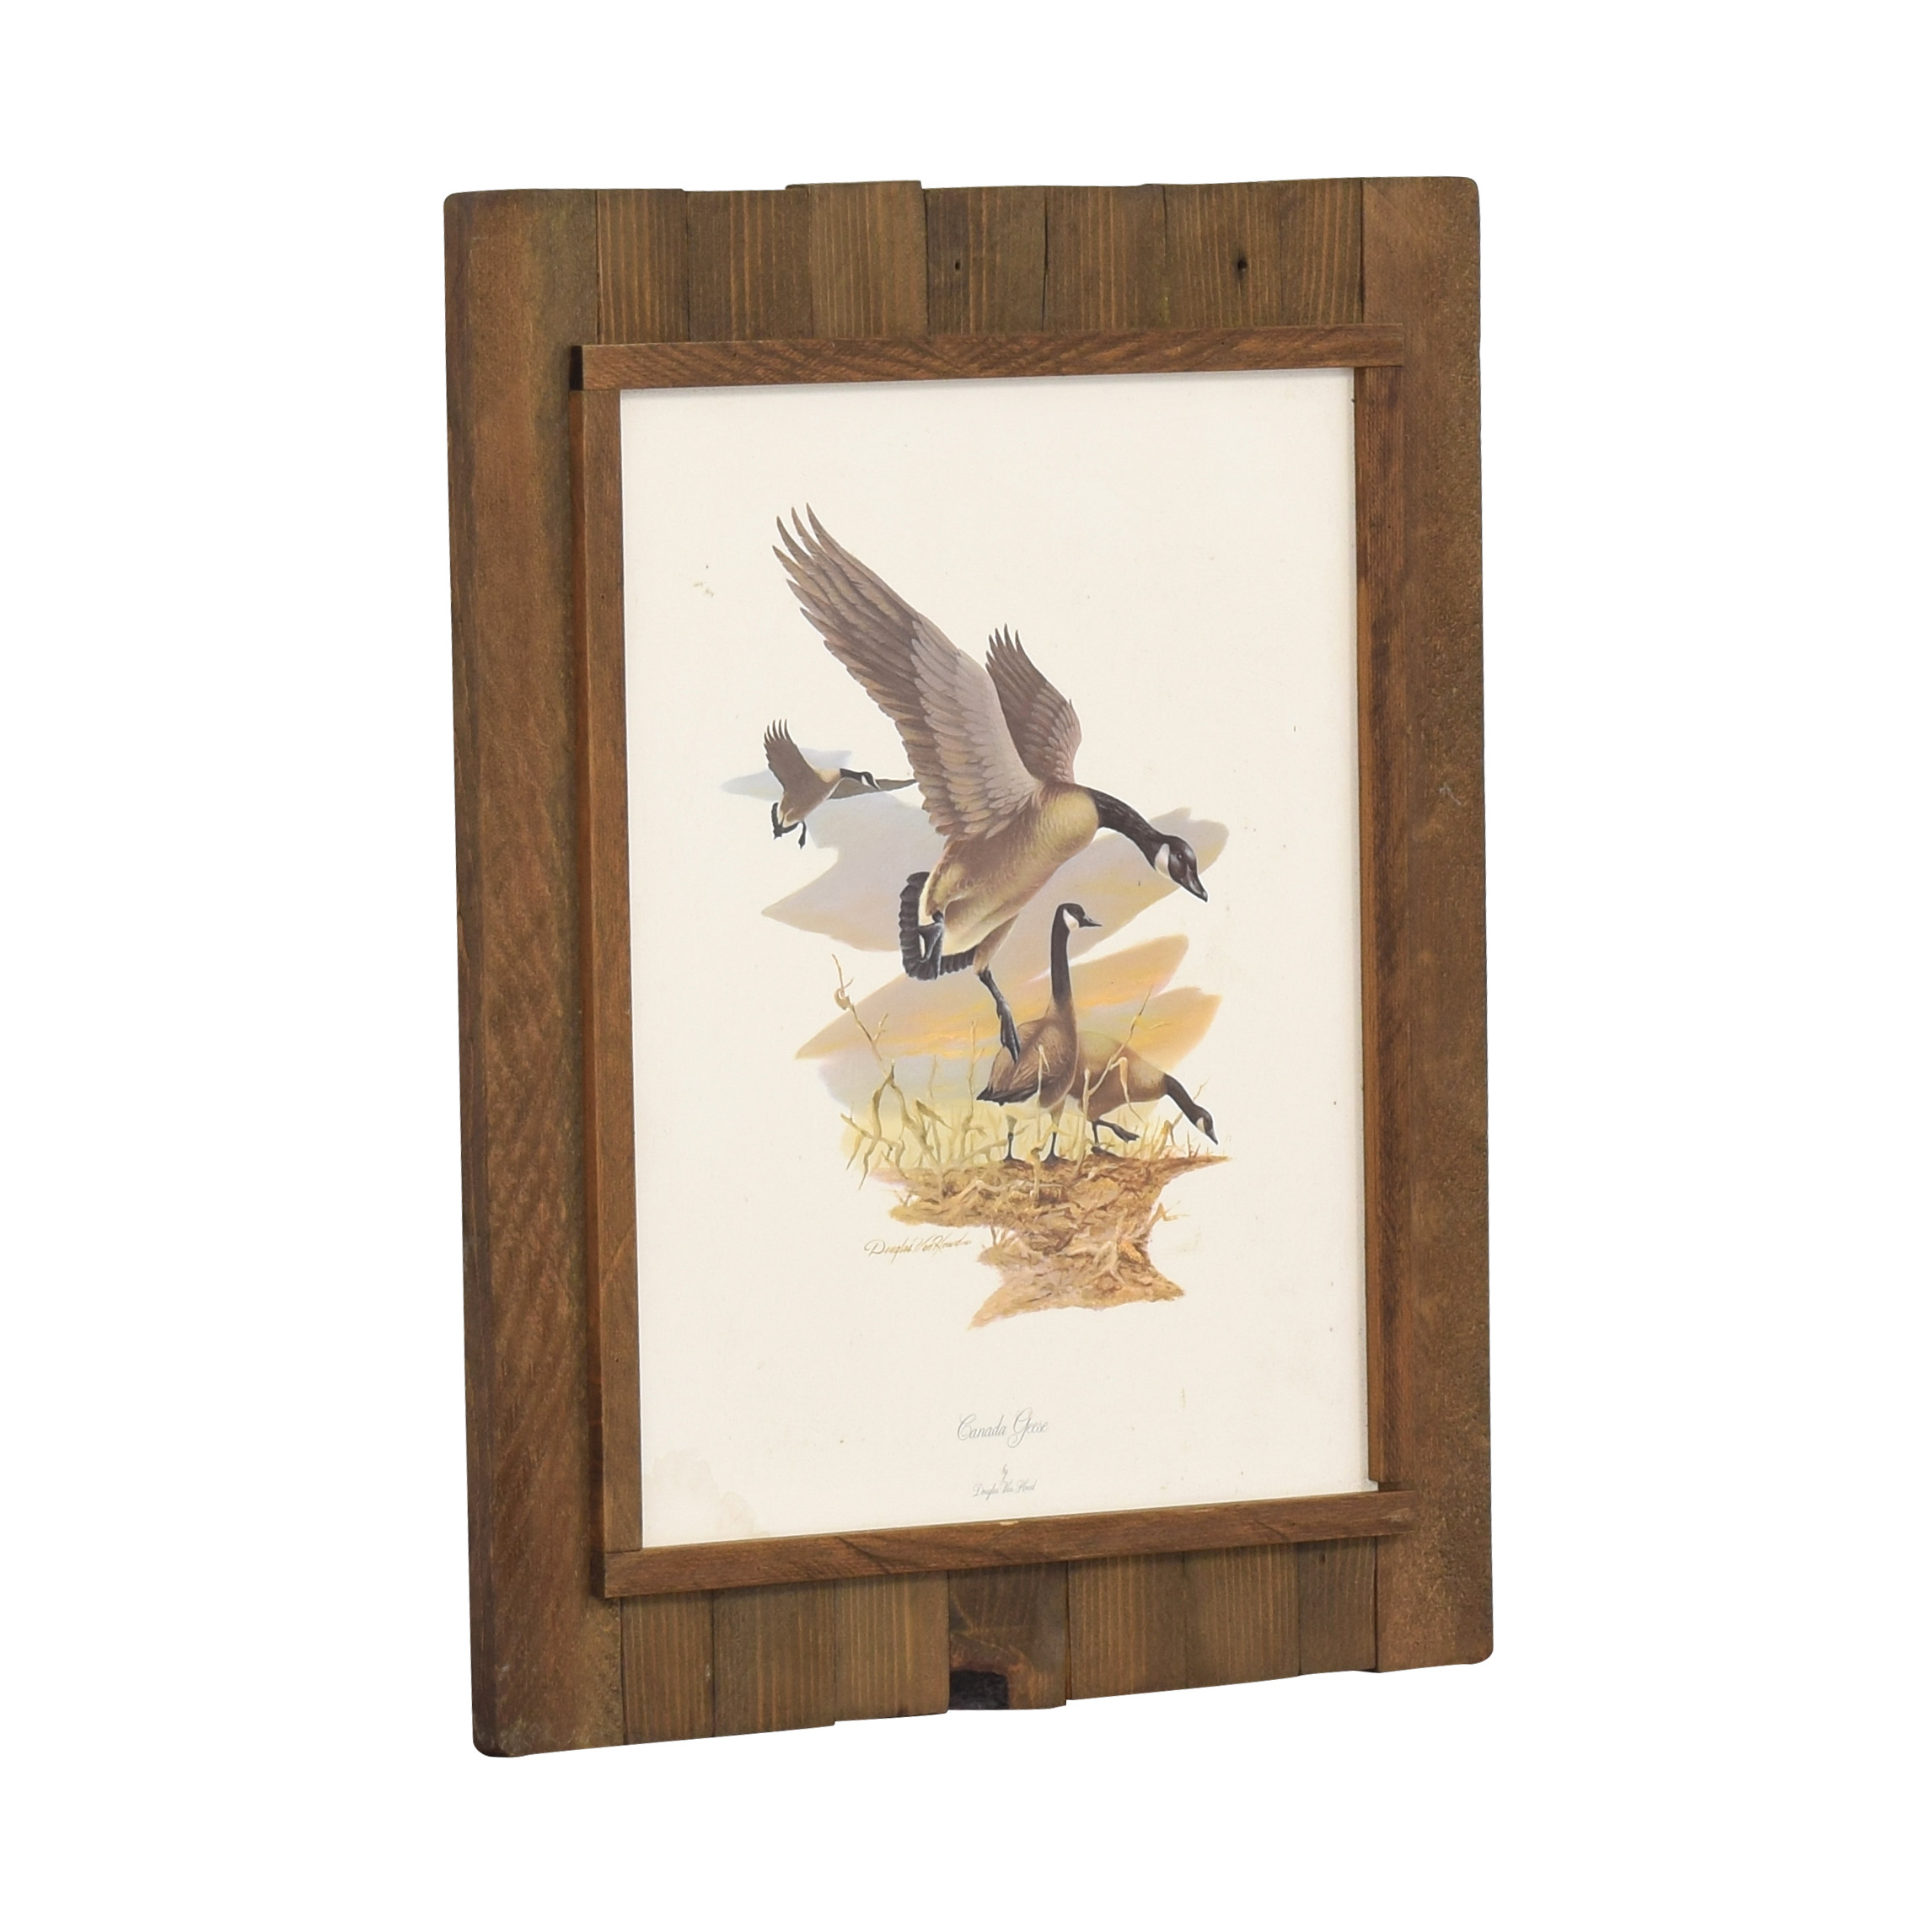 Douglas Van Howd Wood Panel Wall Art ma